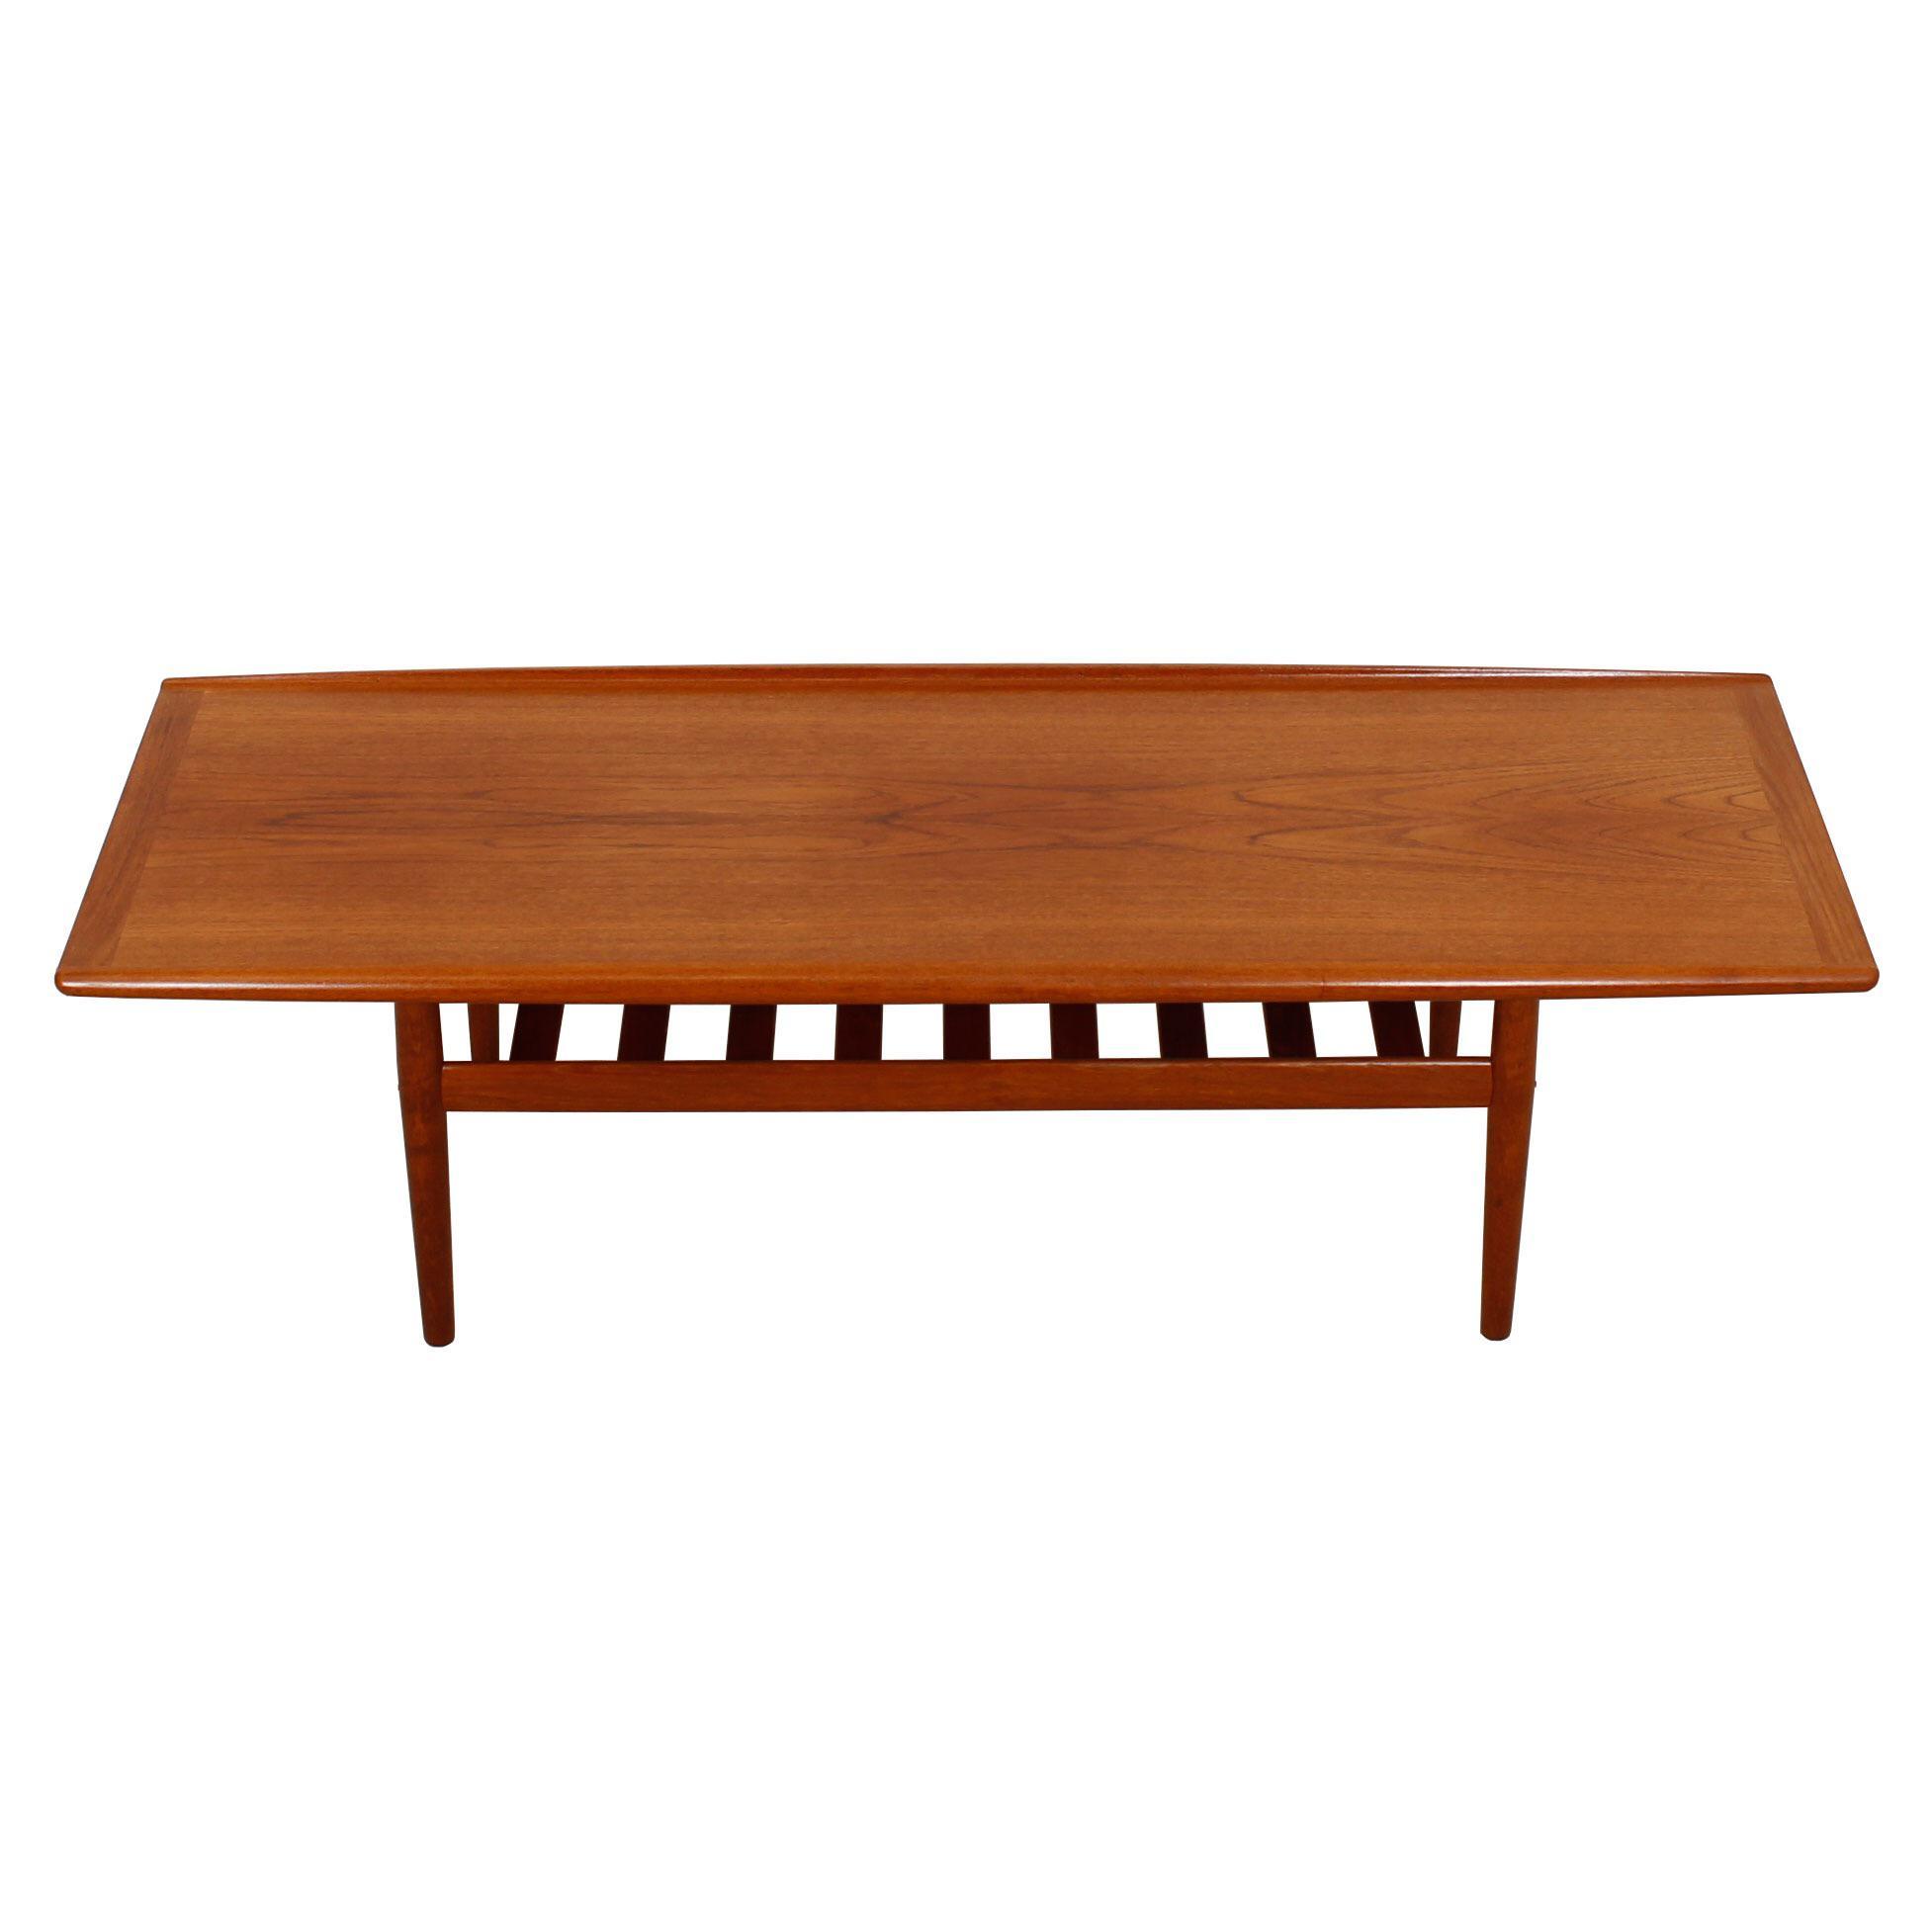 grete jalk danish teak surfboard coffee table | chairish